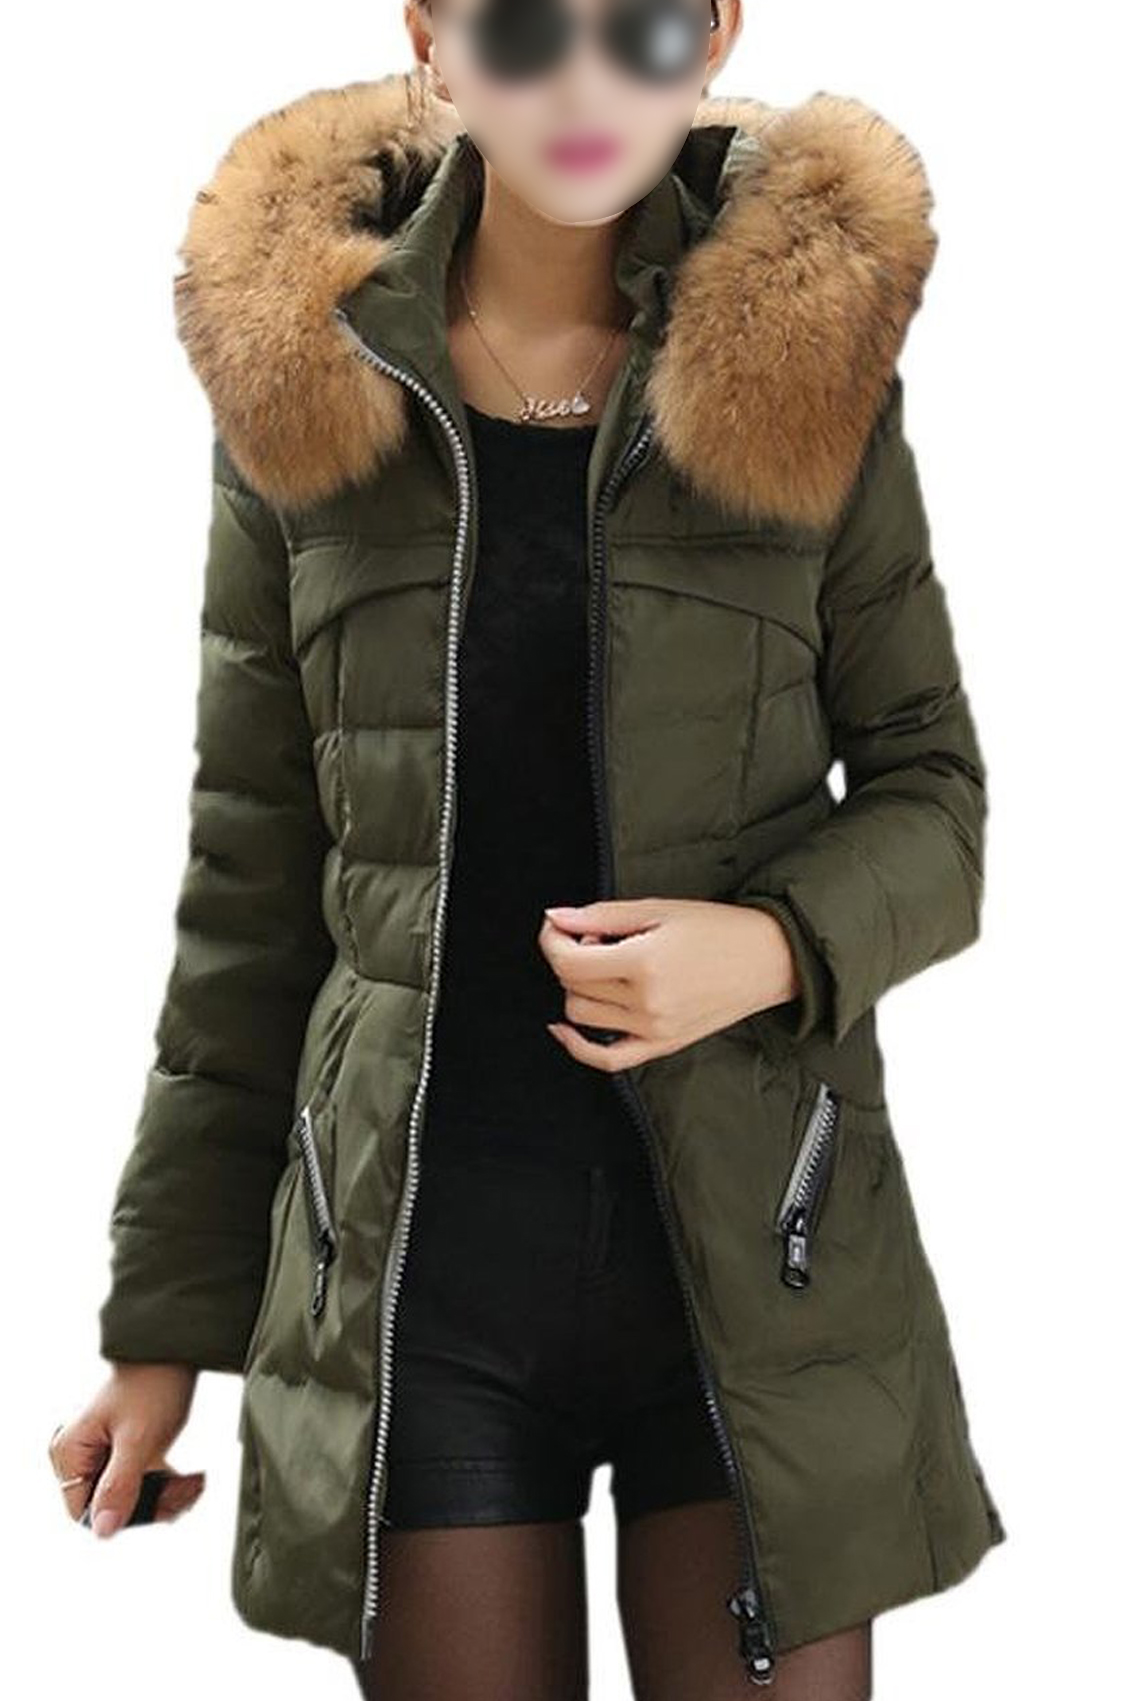 Top Fashionable Goods Shop TFGS Women Casual Winter Slim Thick Long Down Jacket Fur Collar Coat Overcoat